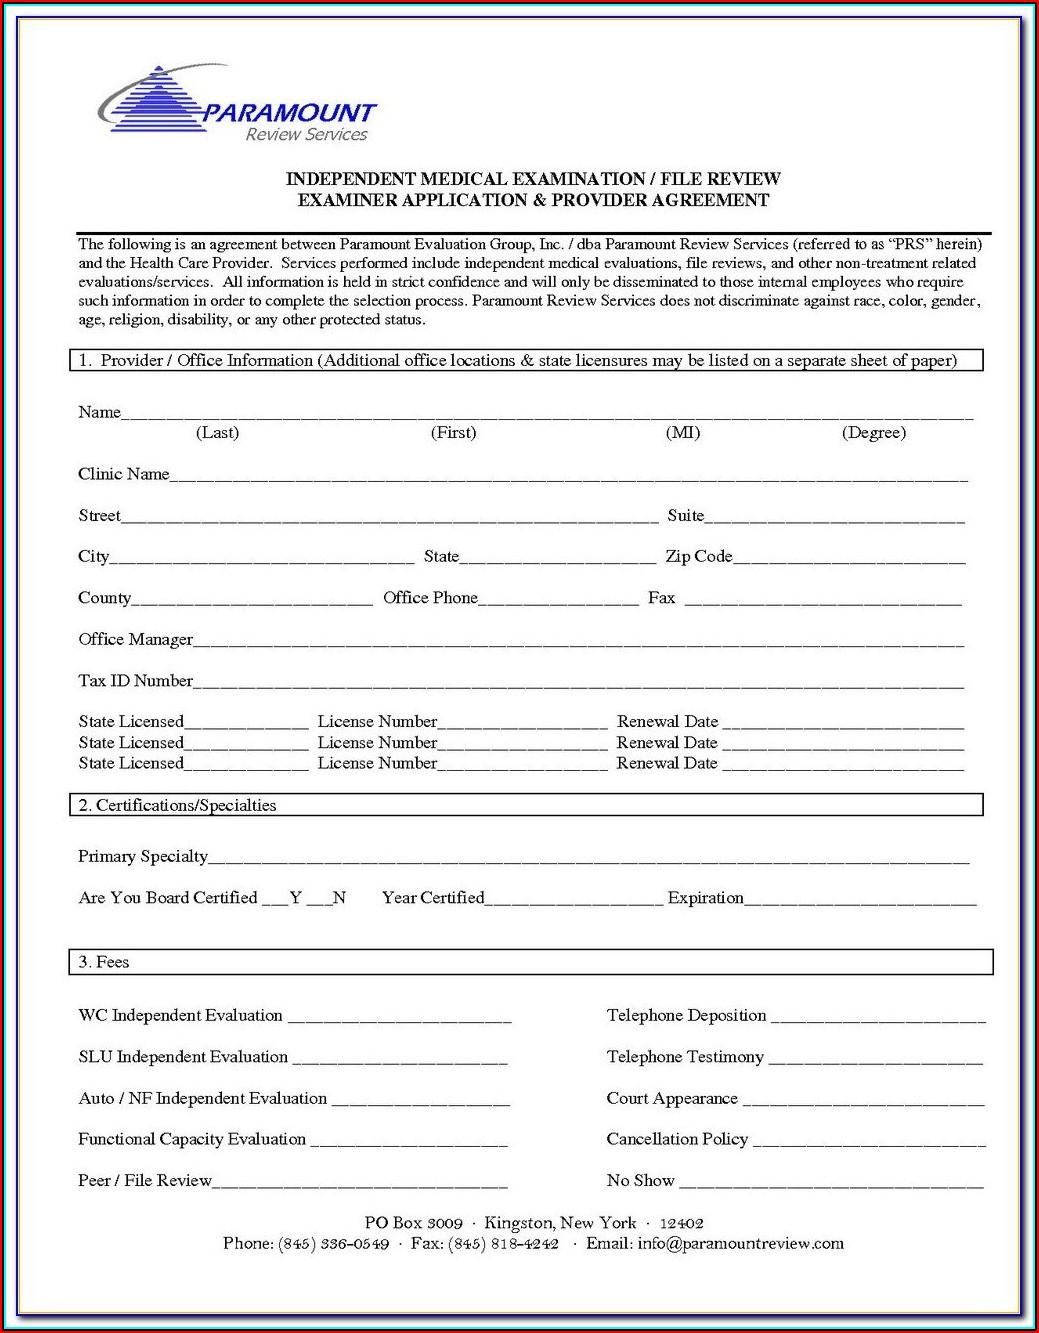 Aarp Medicare Prior Authorization Form